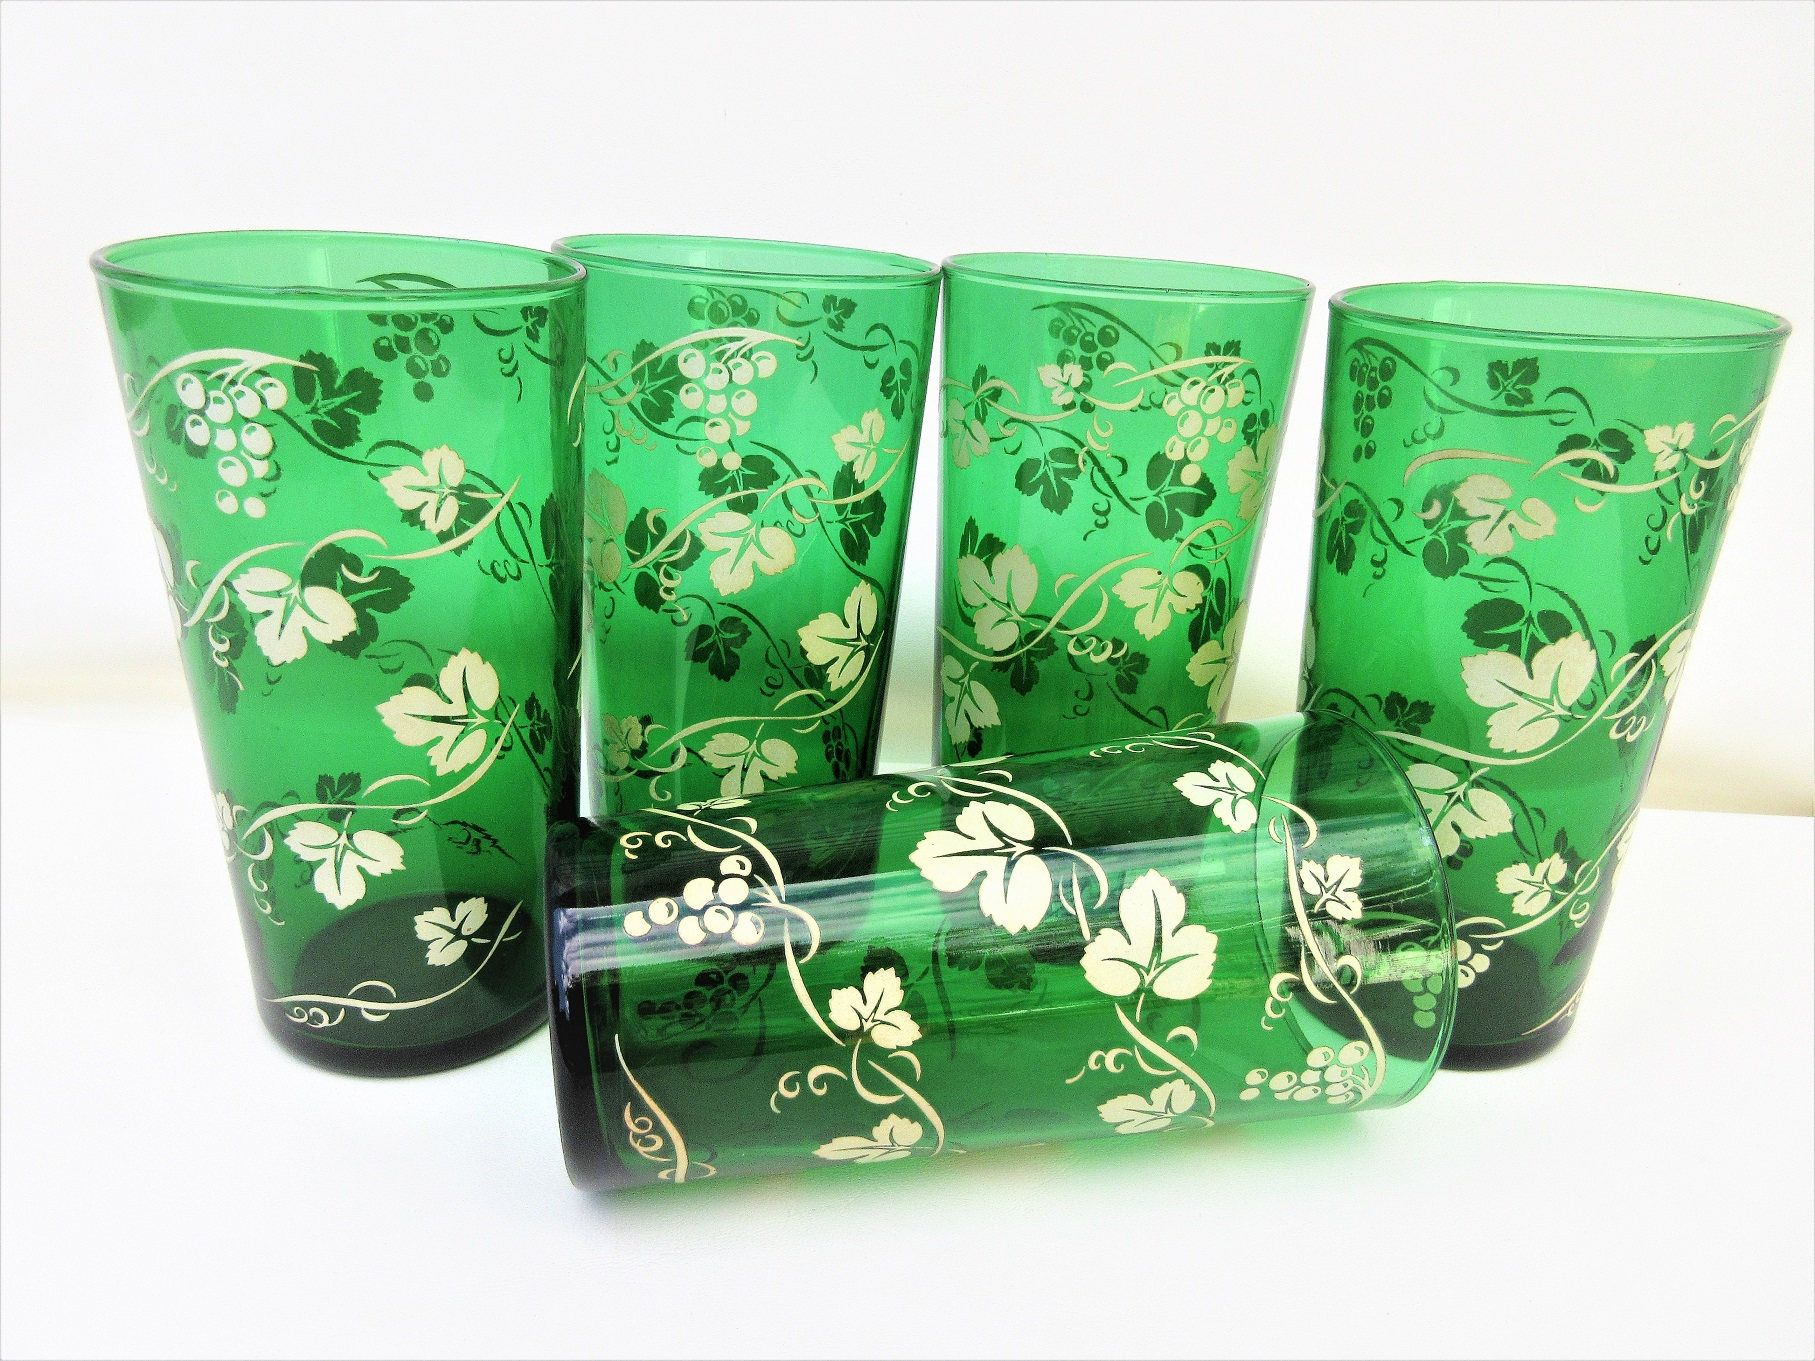 Antique Green Glasses Anchor Hocking Glasses Tall Drinking Glasses Emerald Green Glasses Grapevine Set Tall Drinking Glasses Antique Glasses Antiques